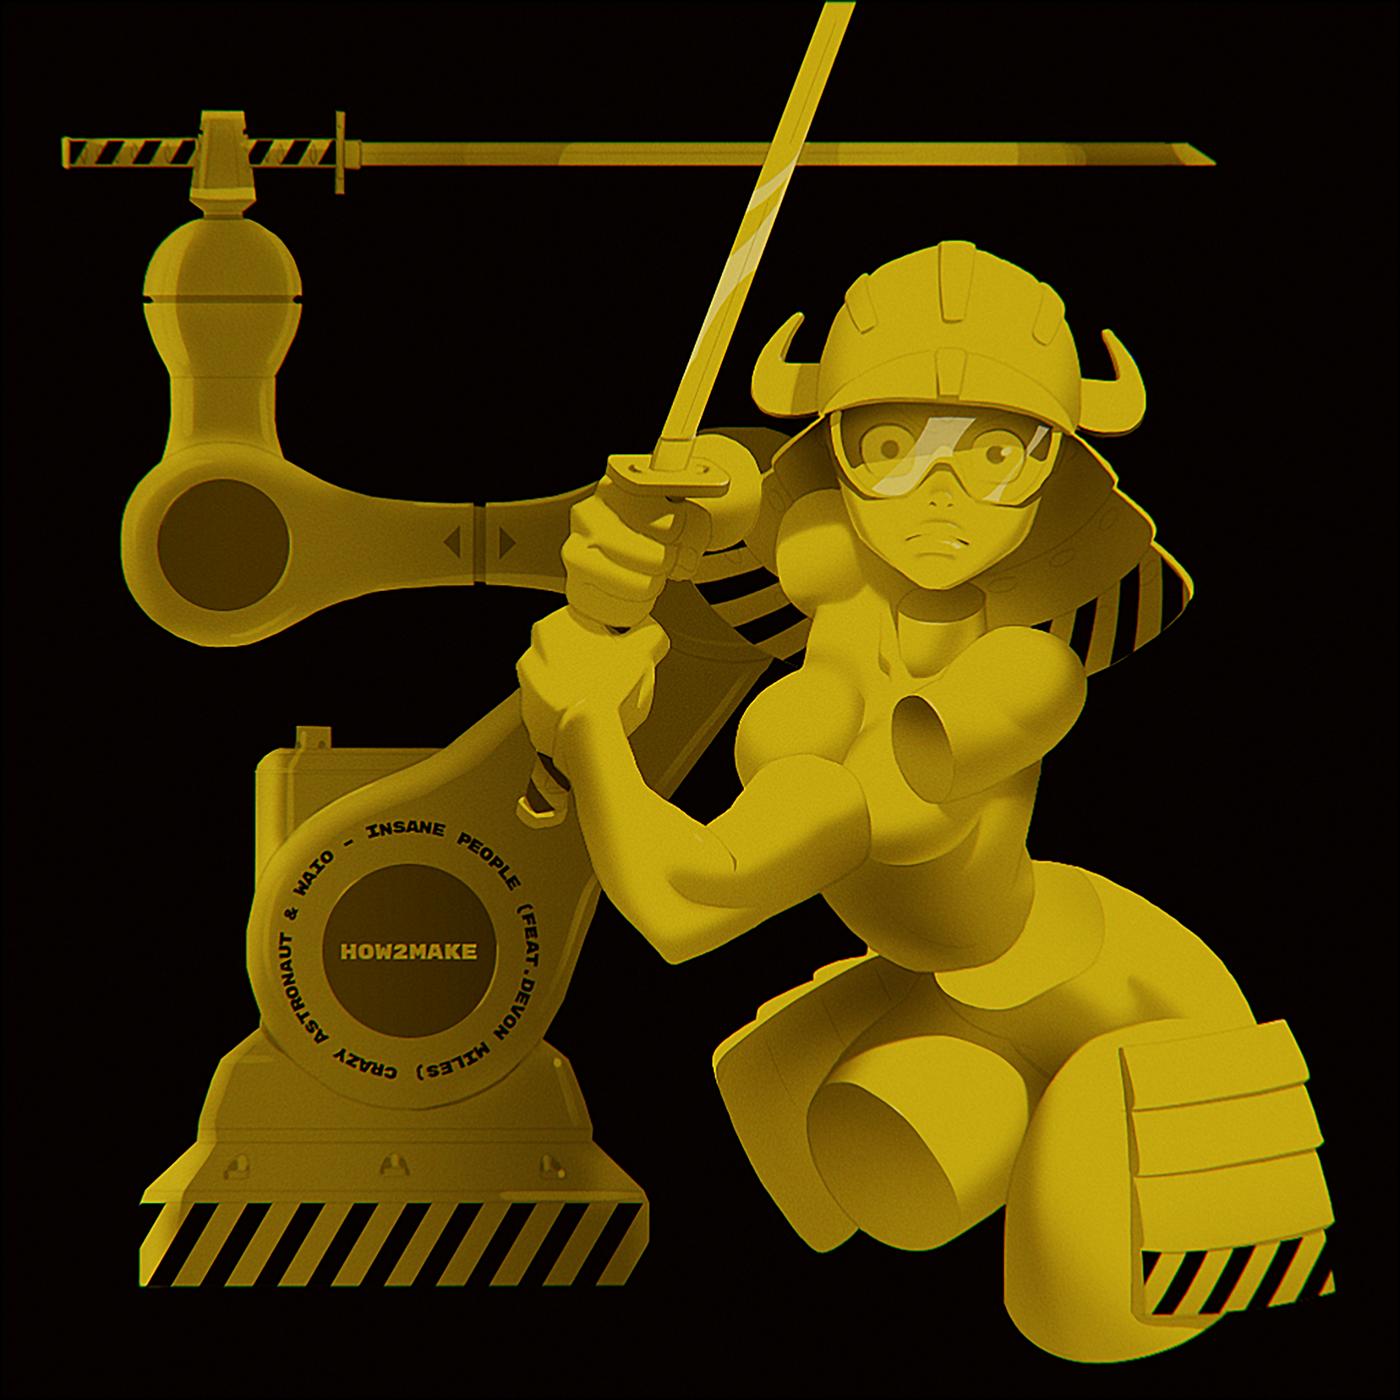 industrial robot arm samurai katana Sword female body parts